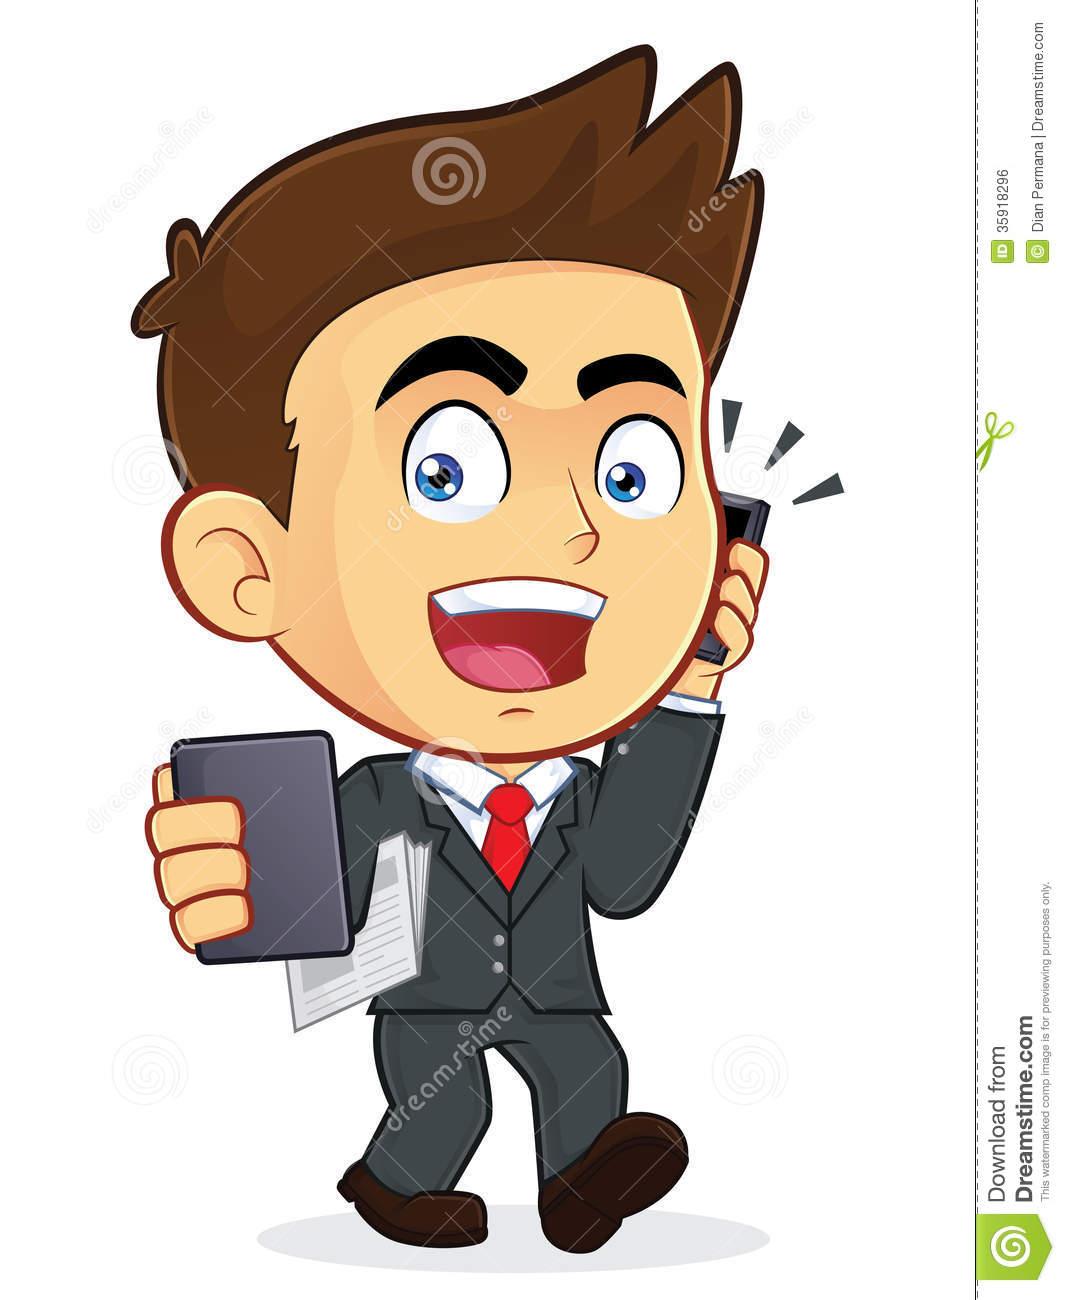 Businessman clipart free jpg royalty free Businessman Clipart Free | Clipart Panda - Free Clipart Images jpg royalty free